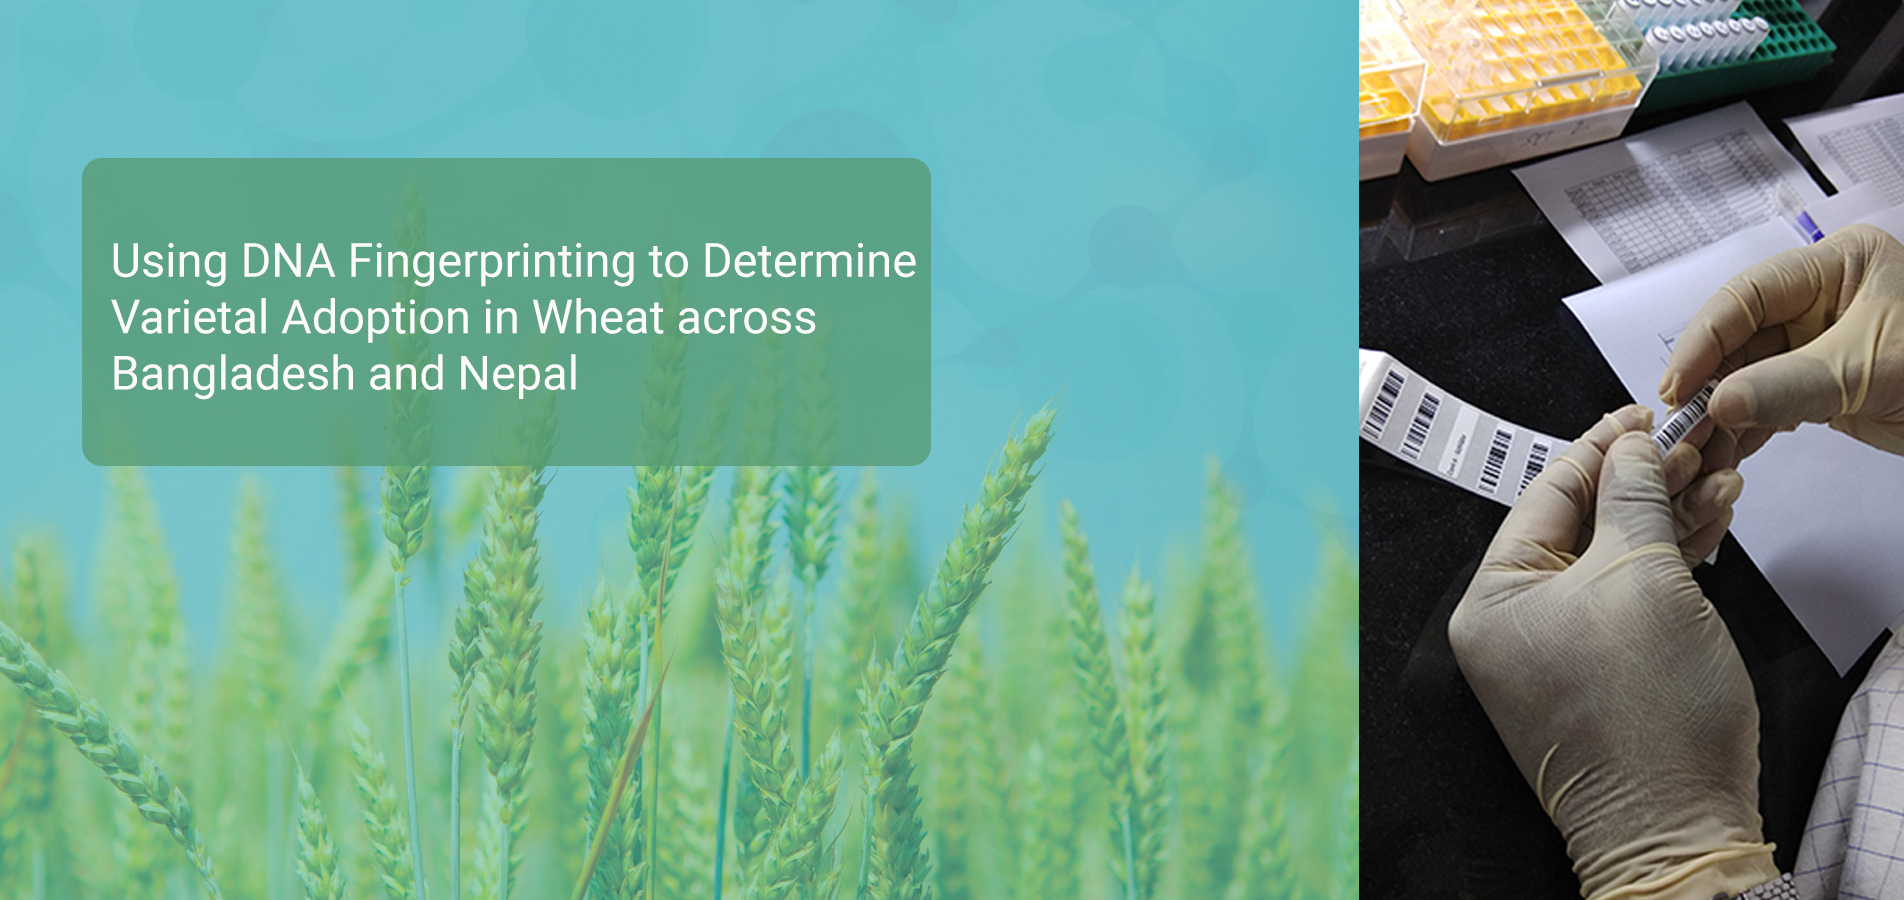 using-dna-fingerprinting-to-determine-varietal-adoption-in-wheat-across-bangladesh-and-nepal